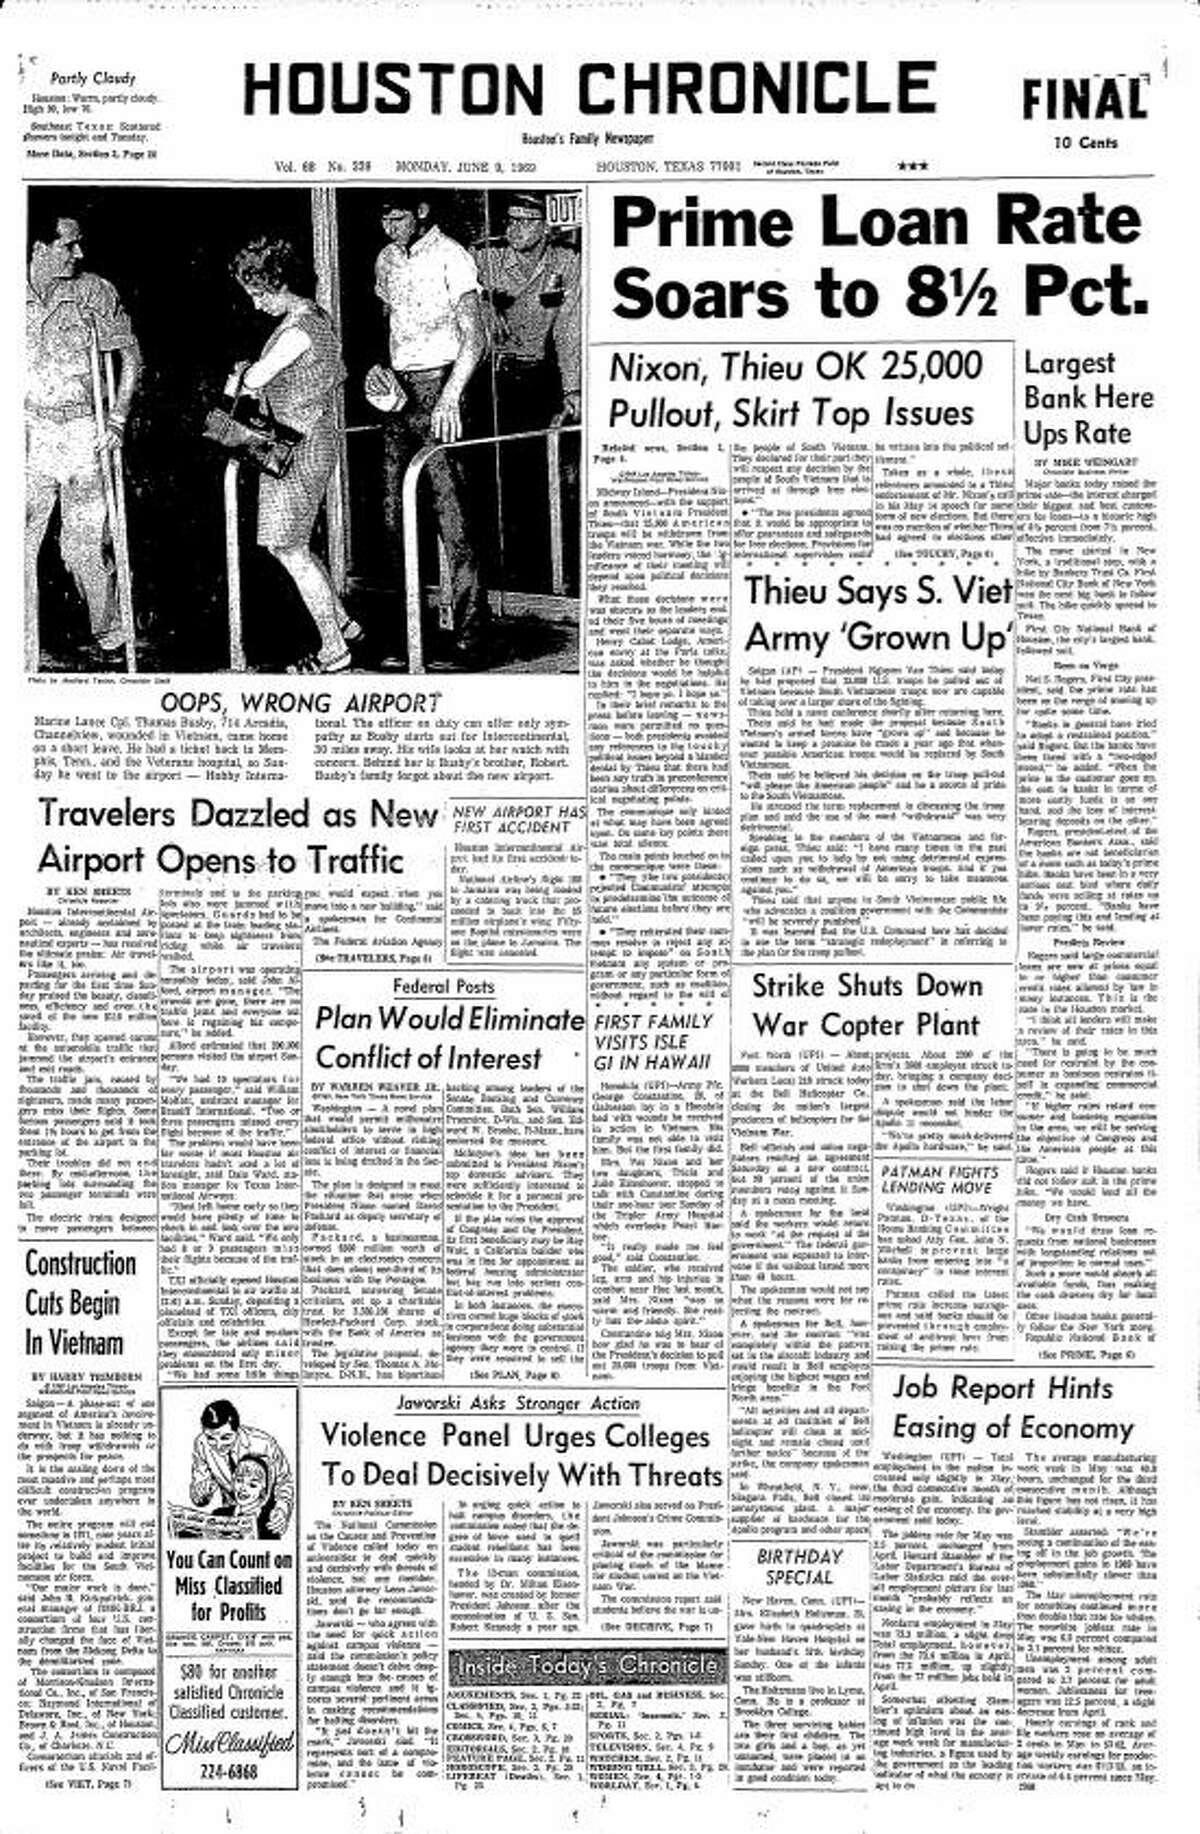 June 9, 1969